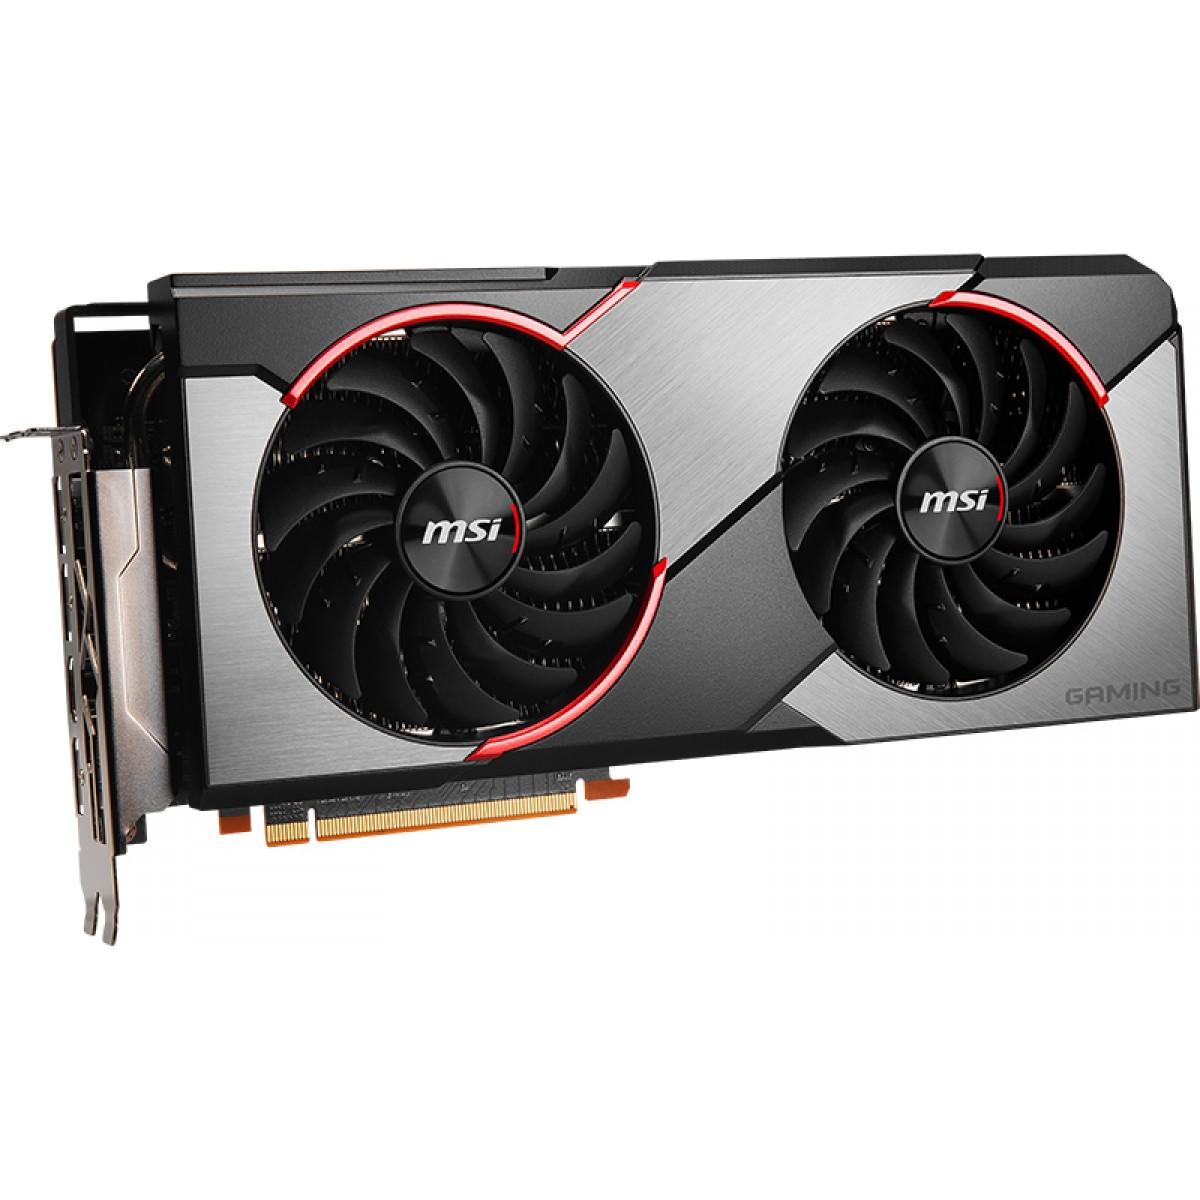 Placa de Vídeo MSI Radeon Navi RX 5700 XT Gaming X Dual, 8GB GDDR6, 256Bit